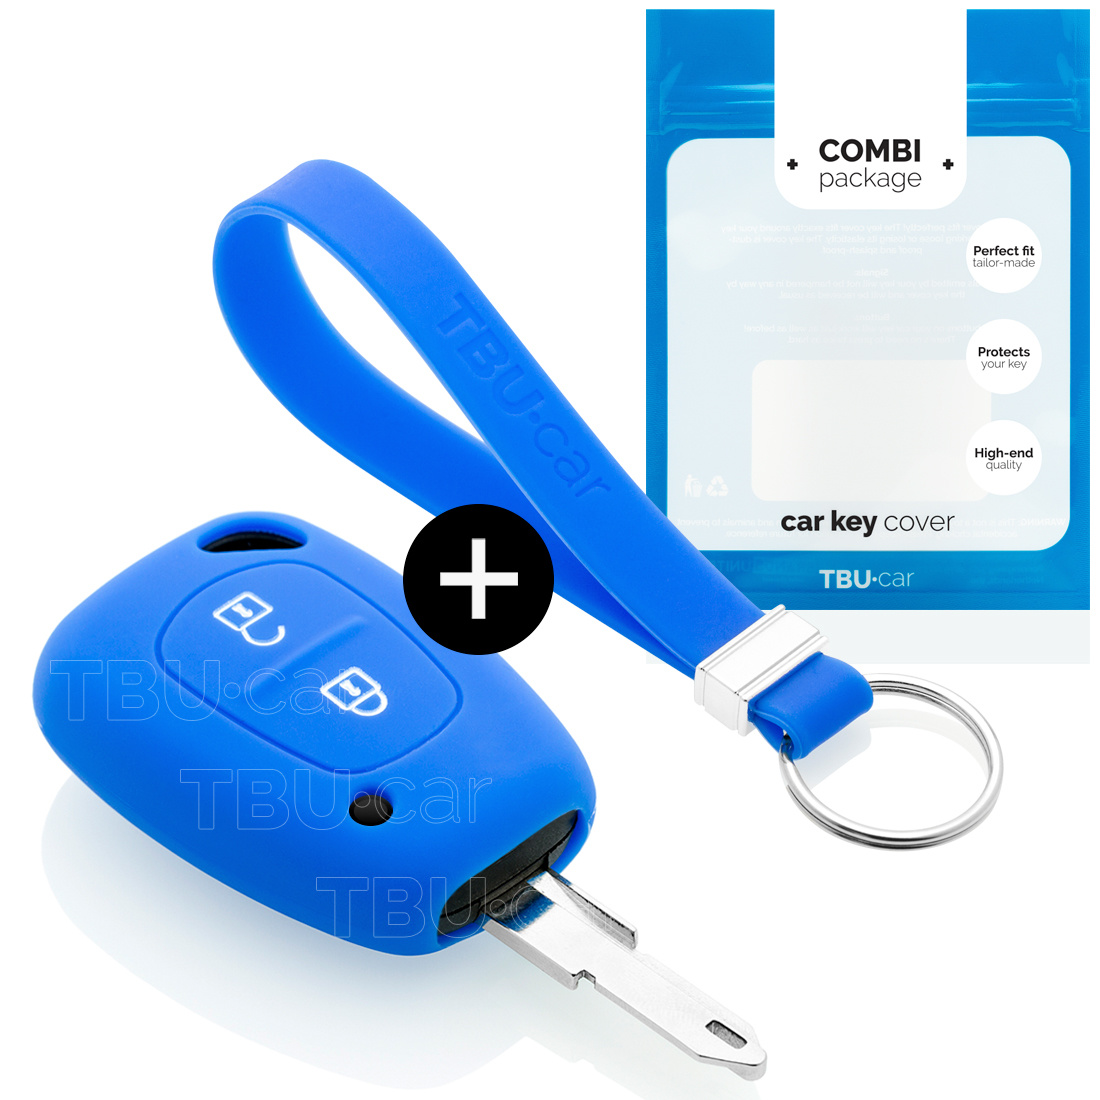 Nissan Autoschlüssel Hülle - Silikon Schutzhülle - Schlüsselhülle Cover - Blau